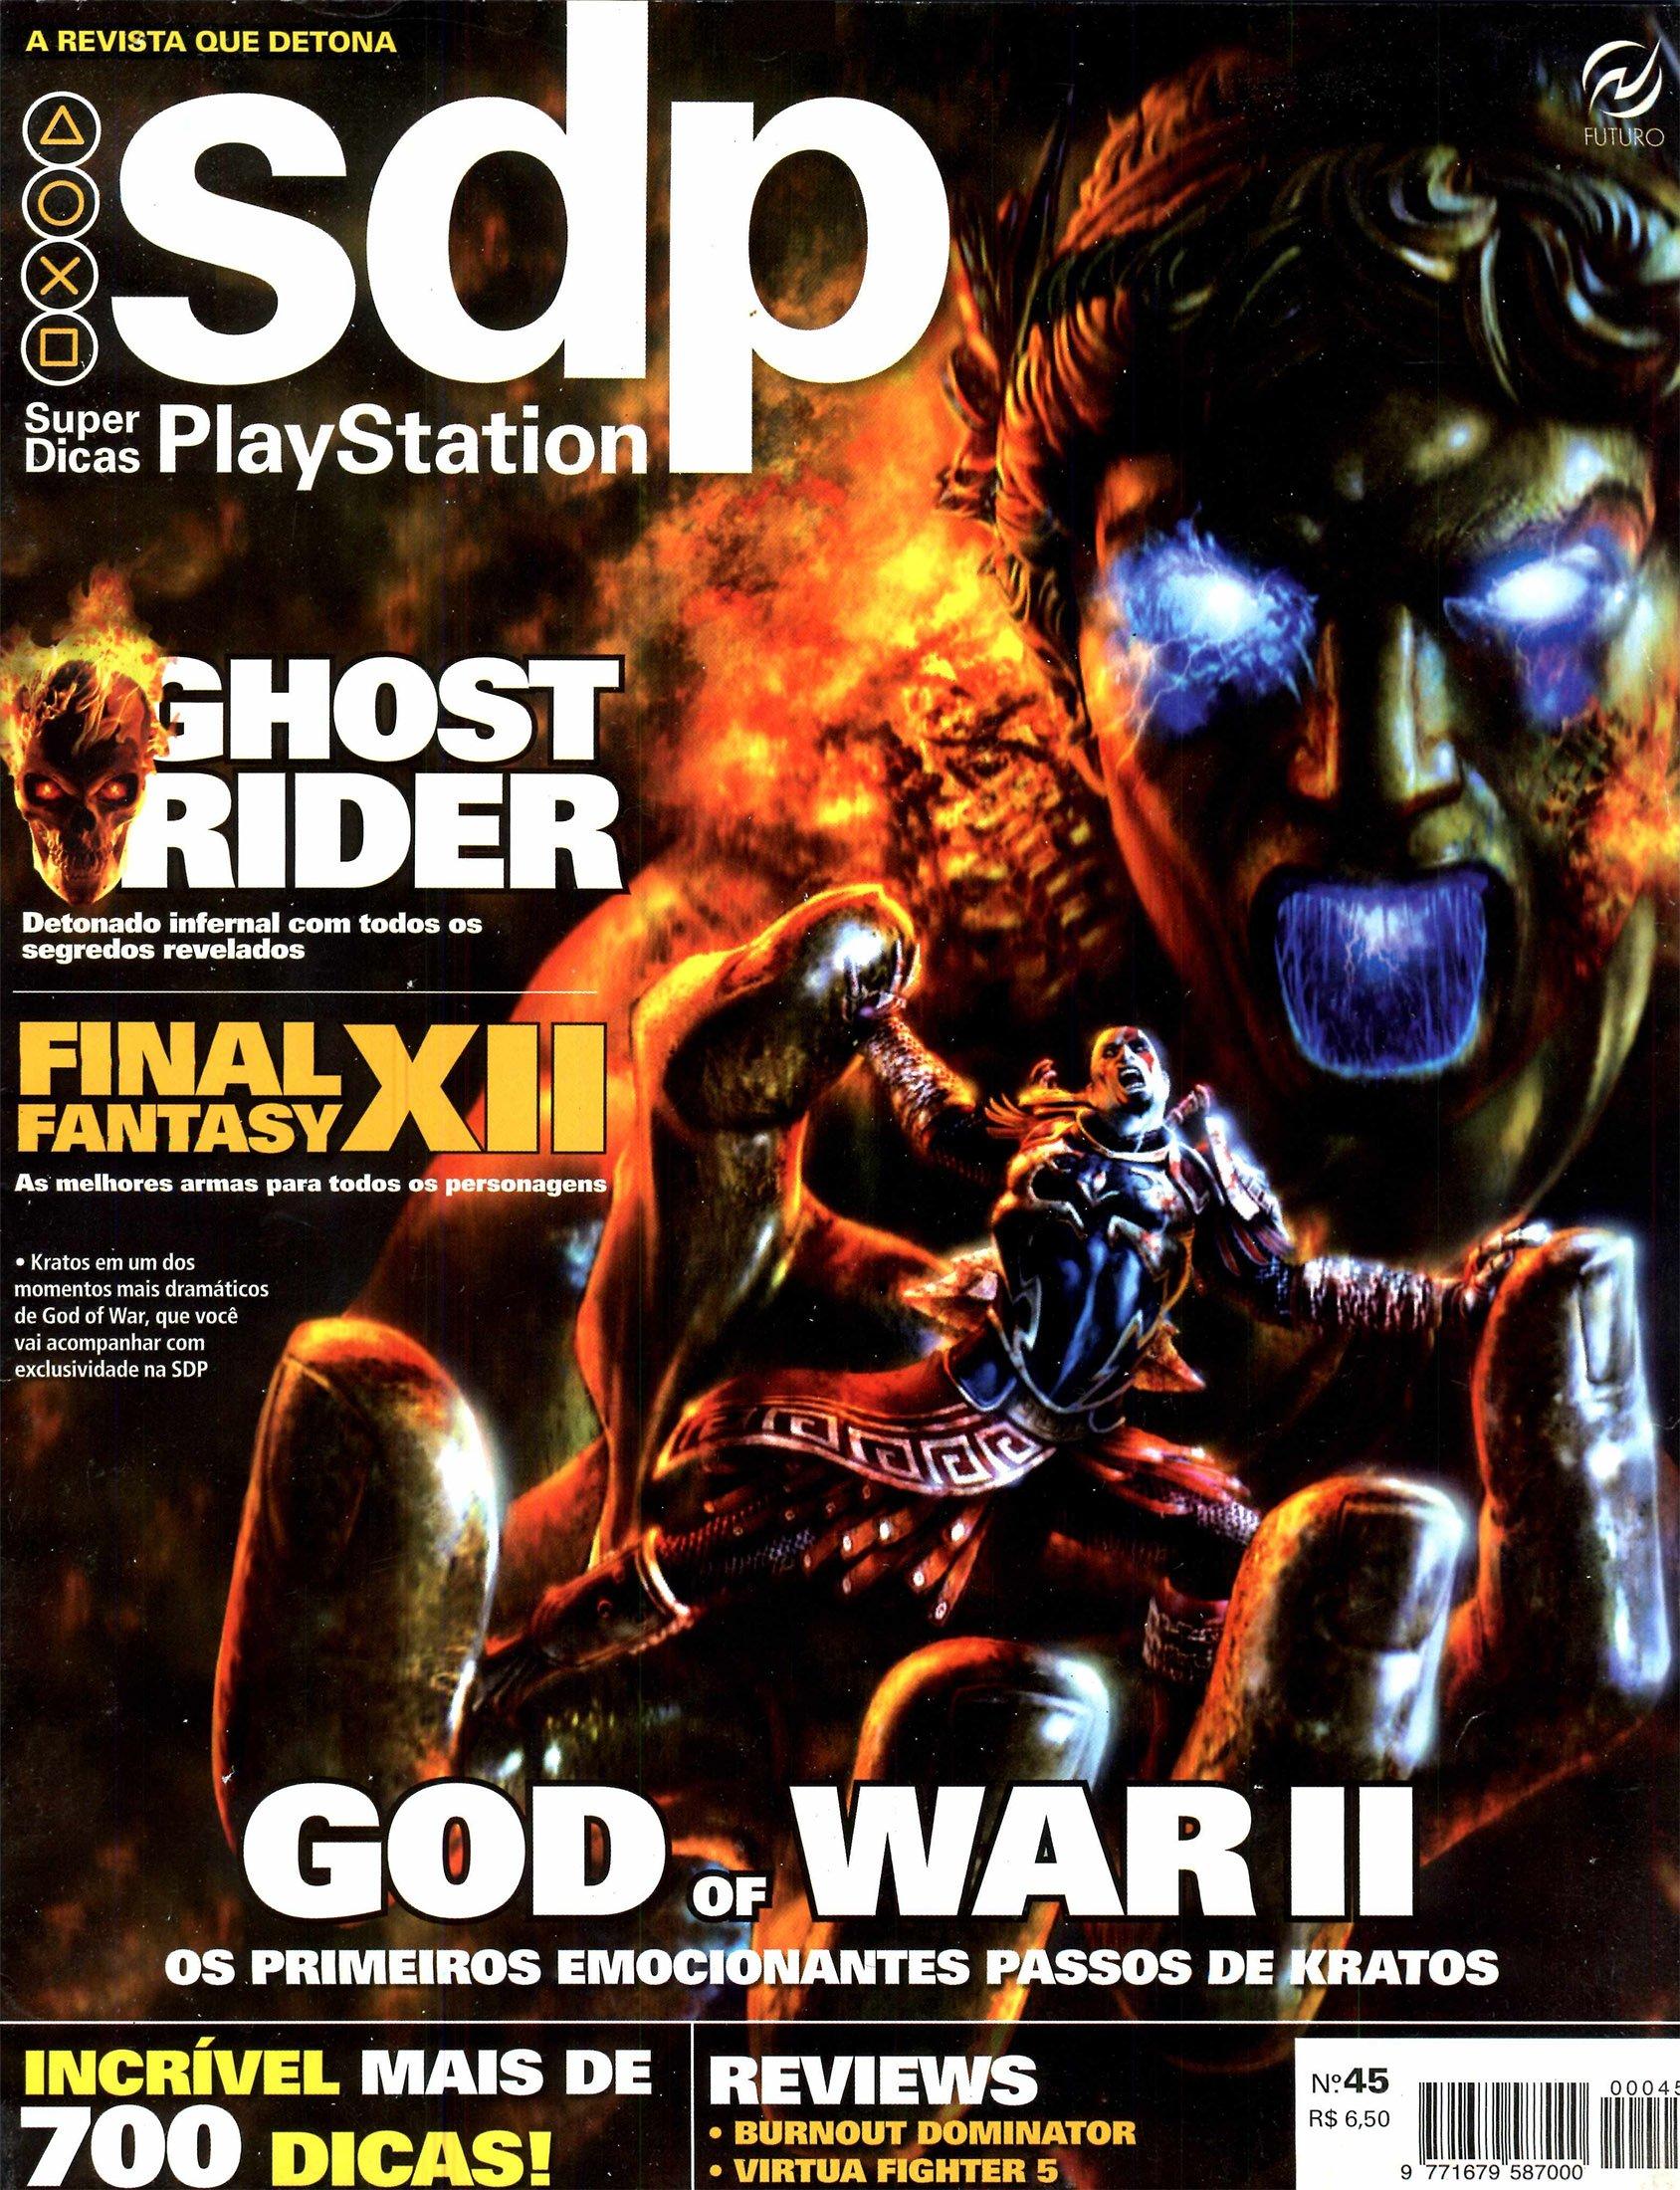 Super Dicas Playstation 45 (March 2007)